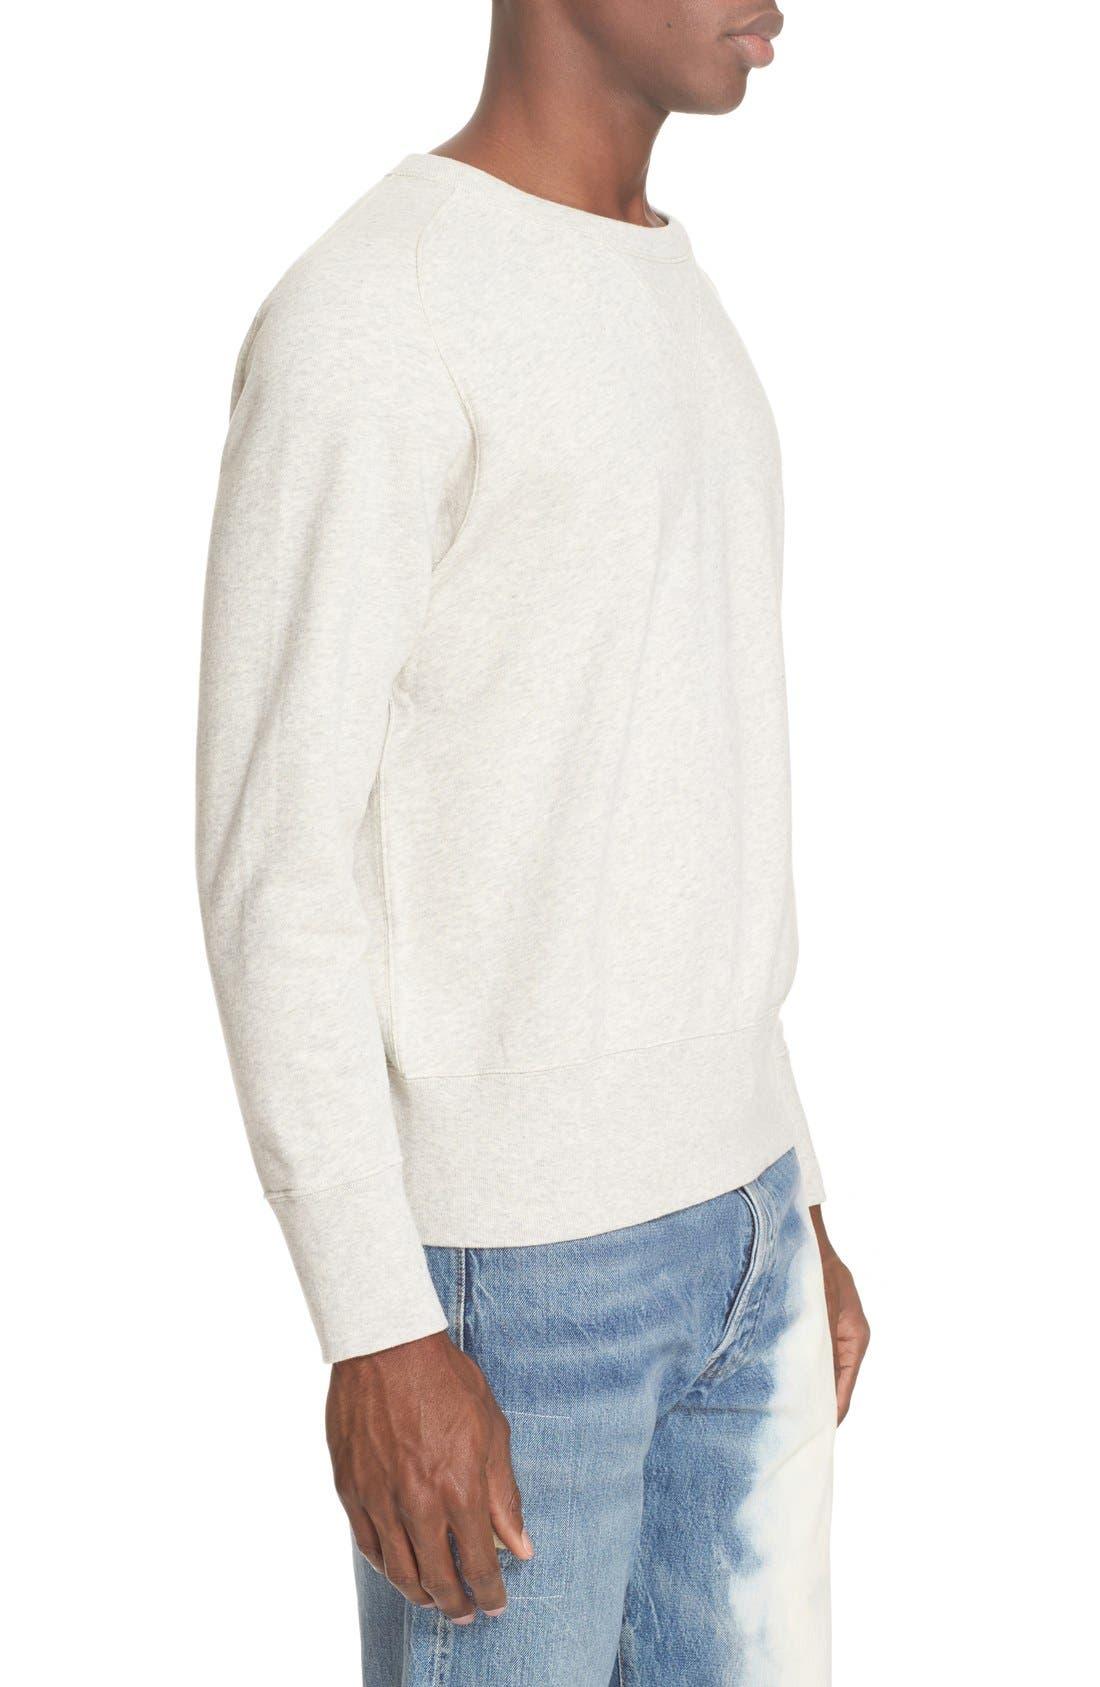 Bay Meadows Sweatshirt,                             Alternate thumbnail 3, color,                             White